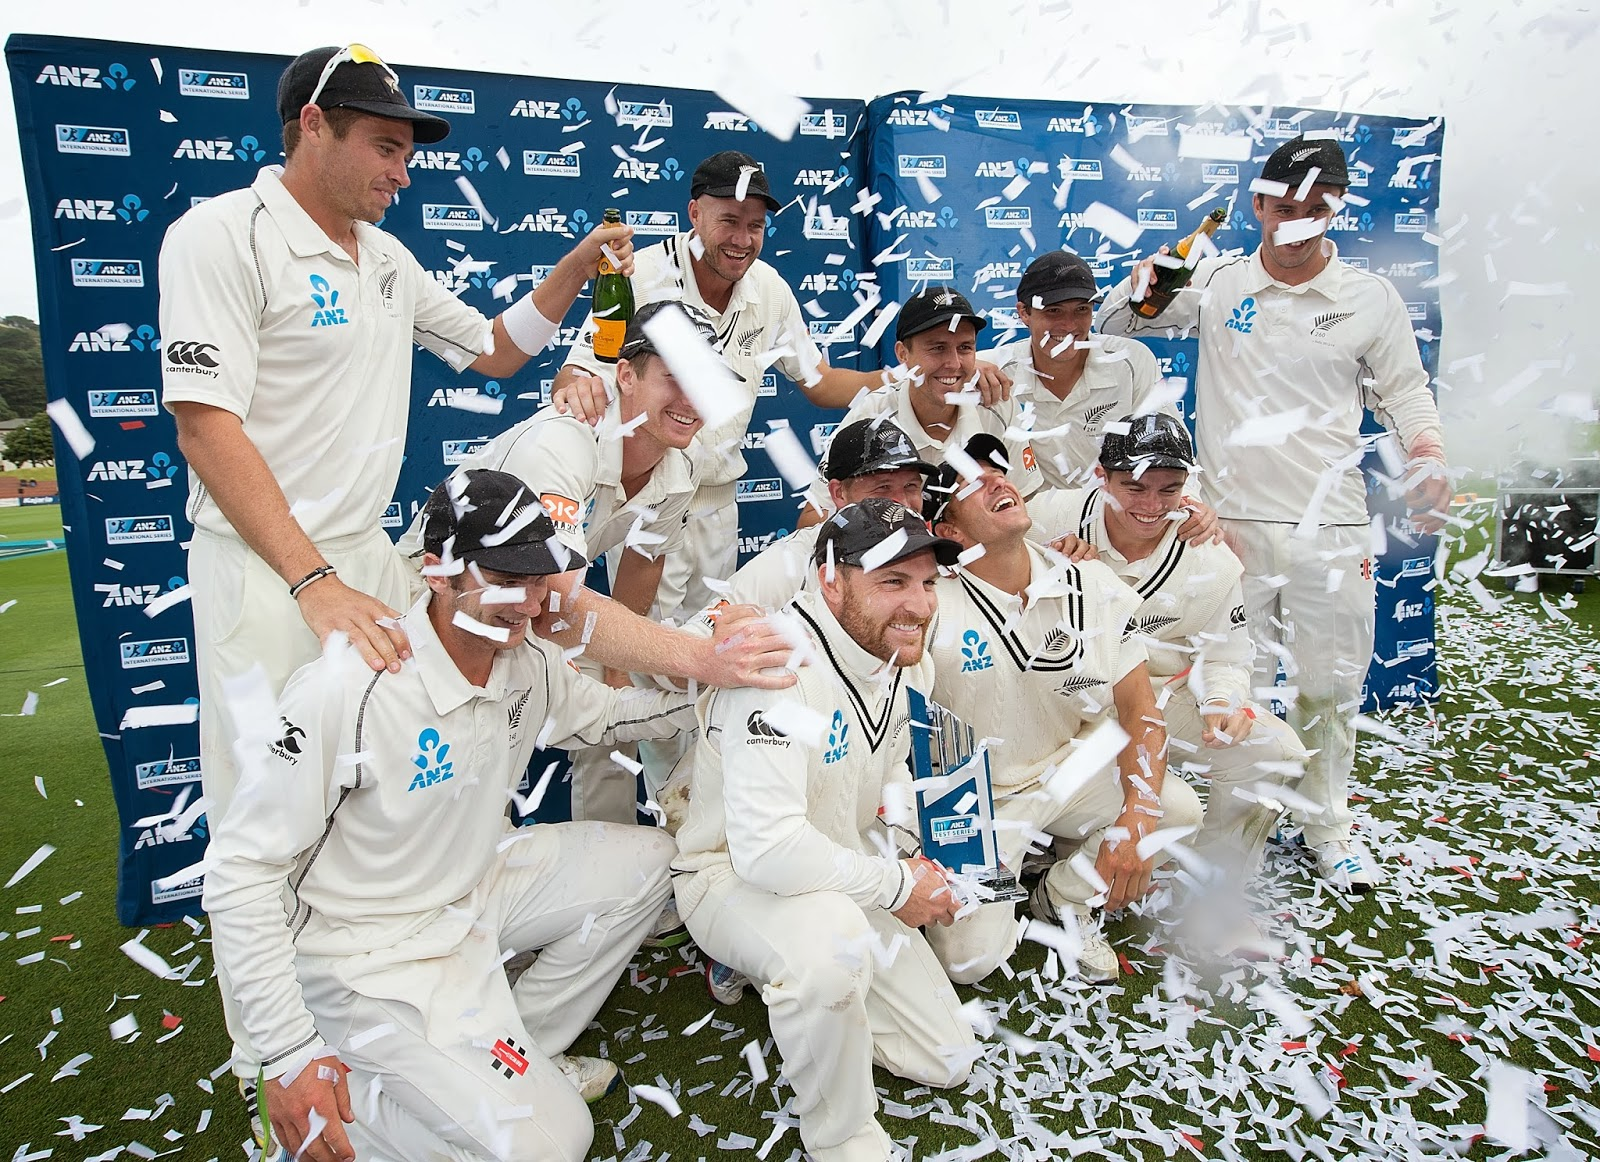 Basin Reserve, Brendon McCullum, Captain, Century, Cricket, History, India Tour New Zealand 2014, Match, New Zealand, New Zealand vs India, Sports, Test Series, Triple-centurion, Trophy, Wellington, Winner,